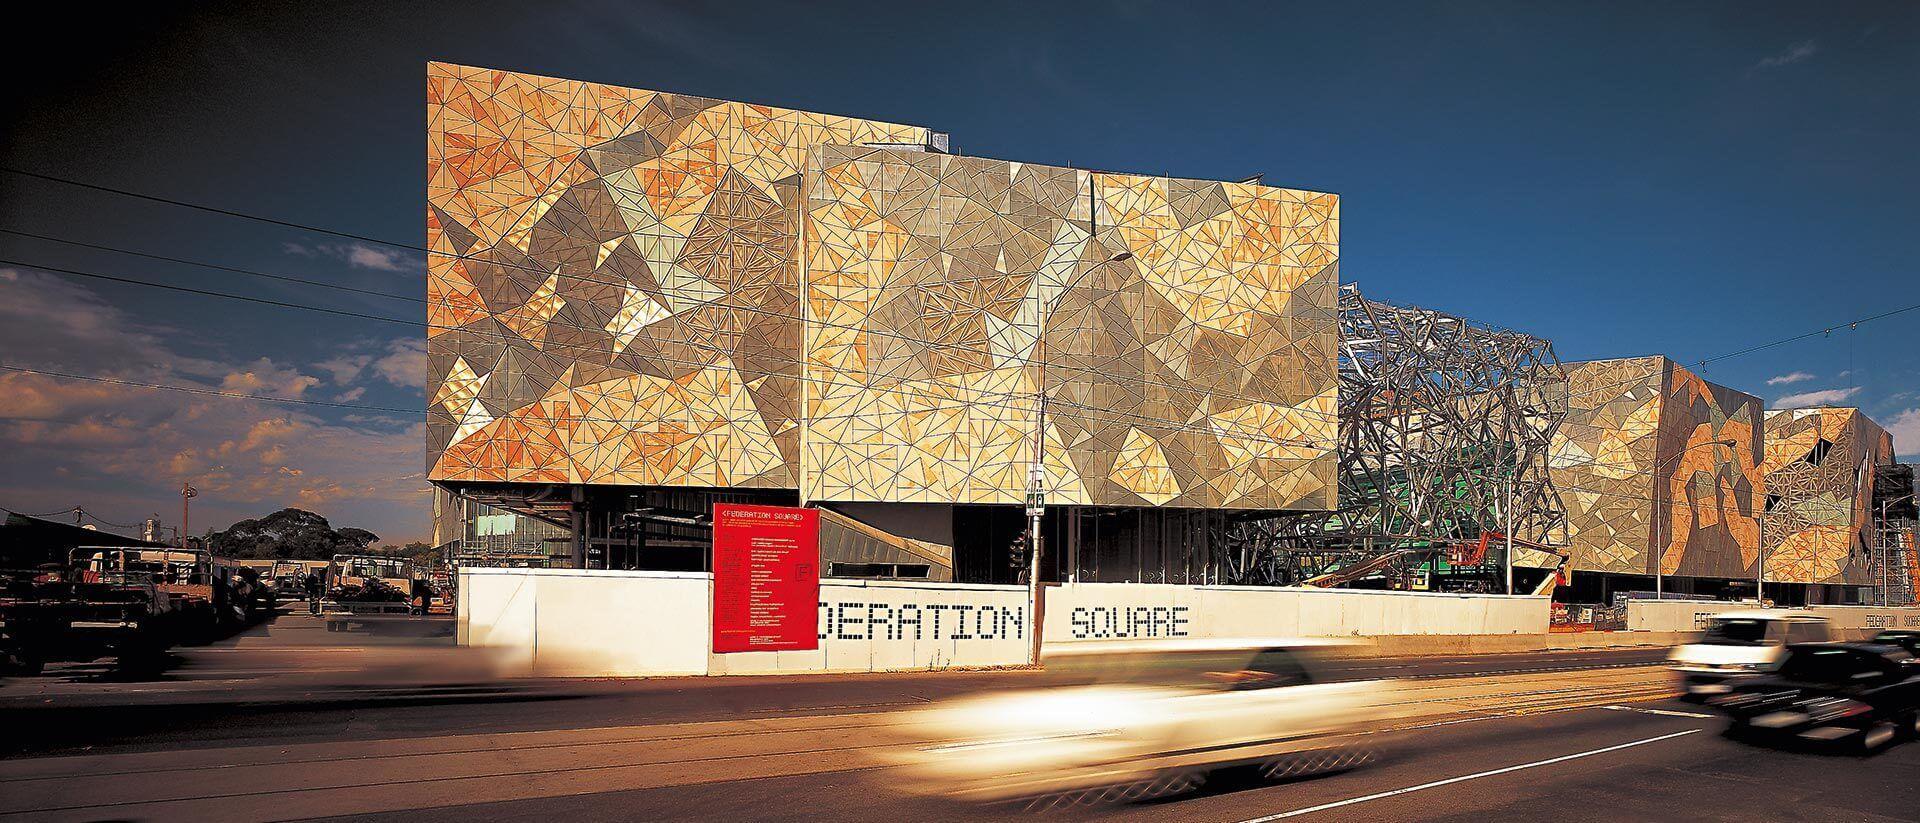 Federation Square Project Architecture